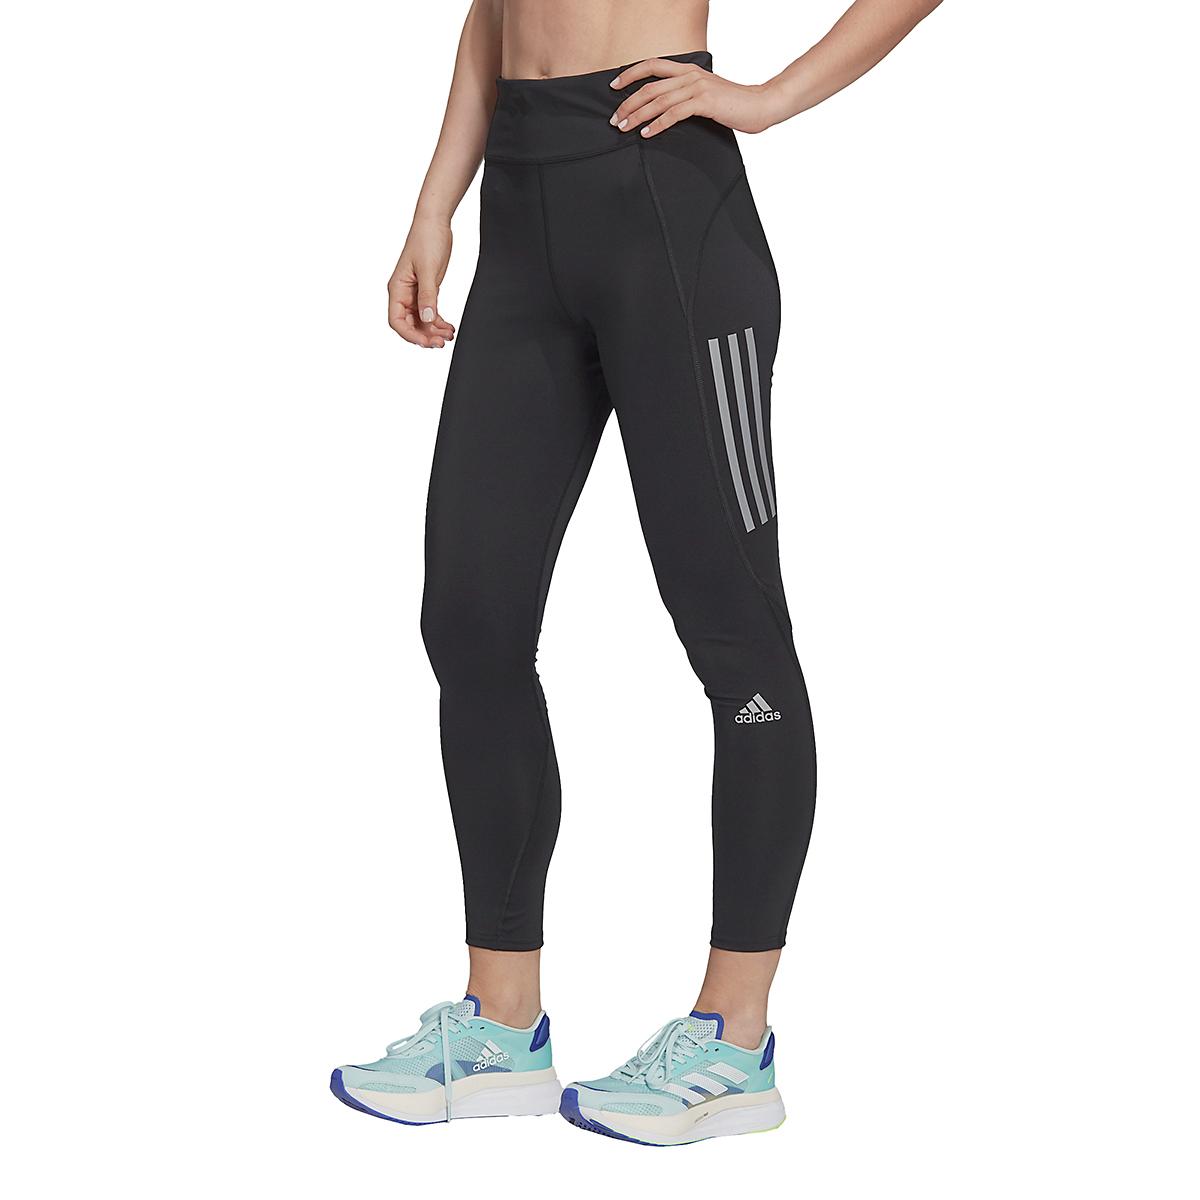 Women's Adidas Own The Run Running Leggings, , large, image 1